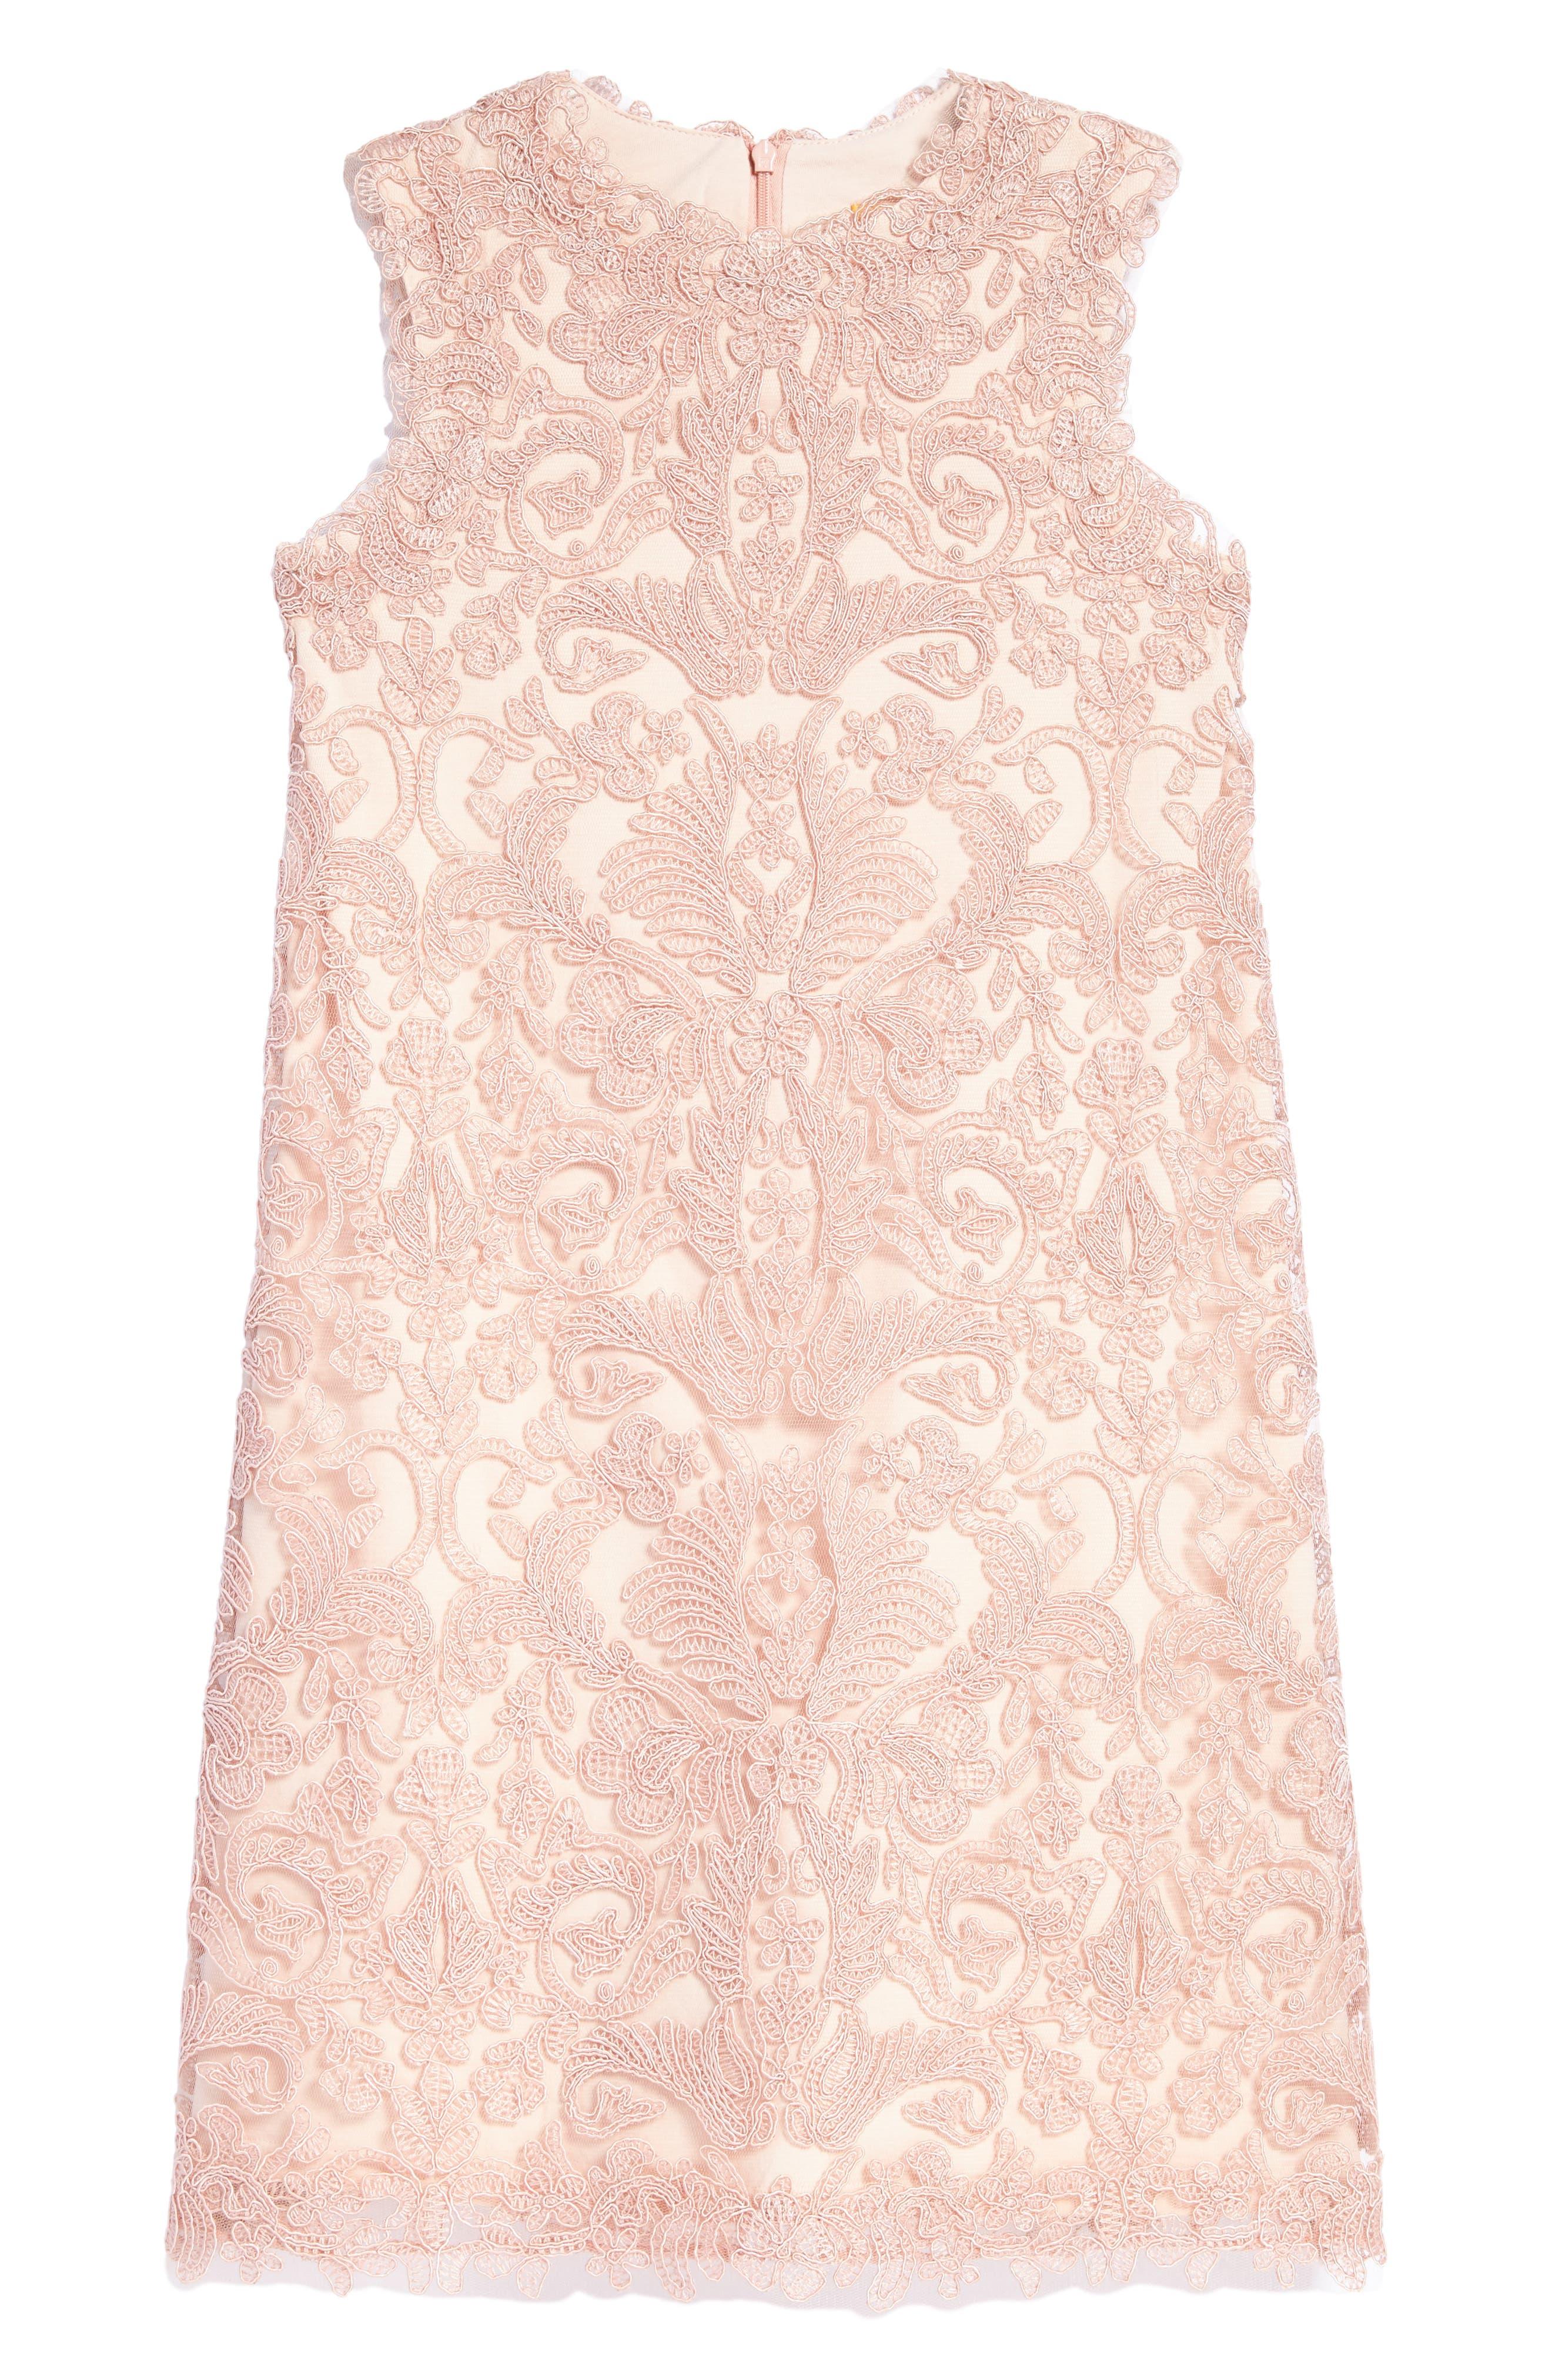 Tadashi Shoji 'Honeysuckle' Embroidered Tulle Dress (Toddler Girls, Little Girls & Big Girls)